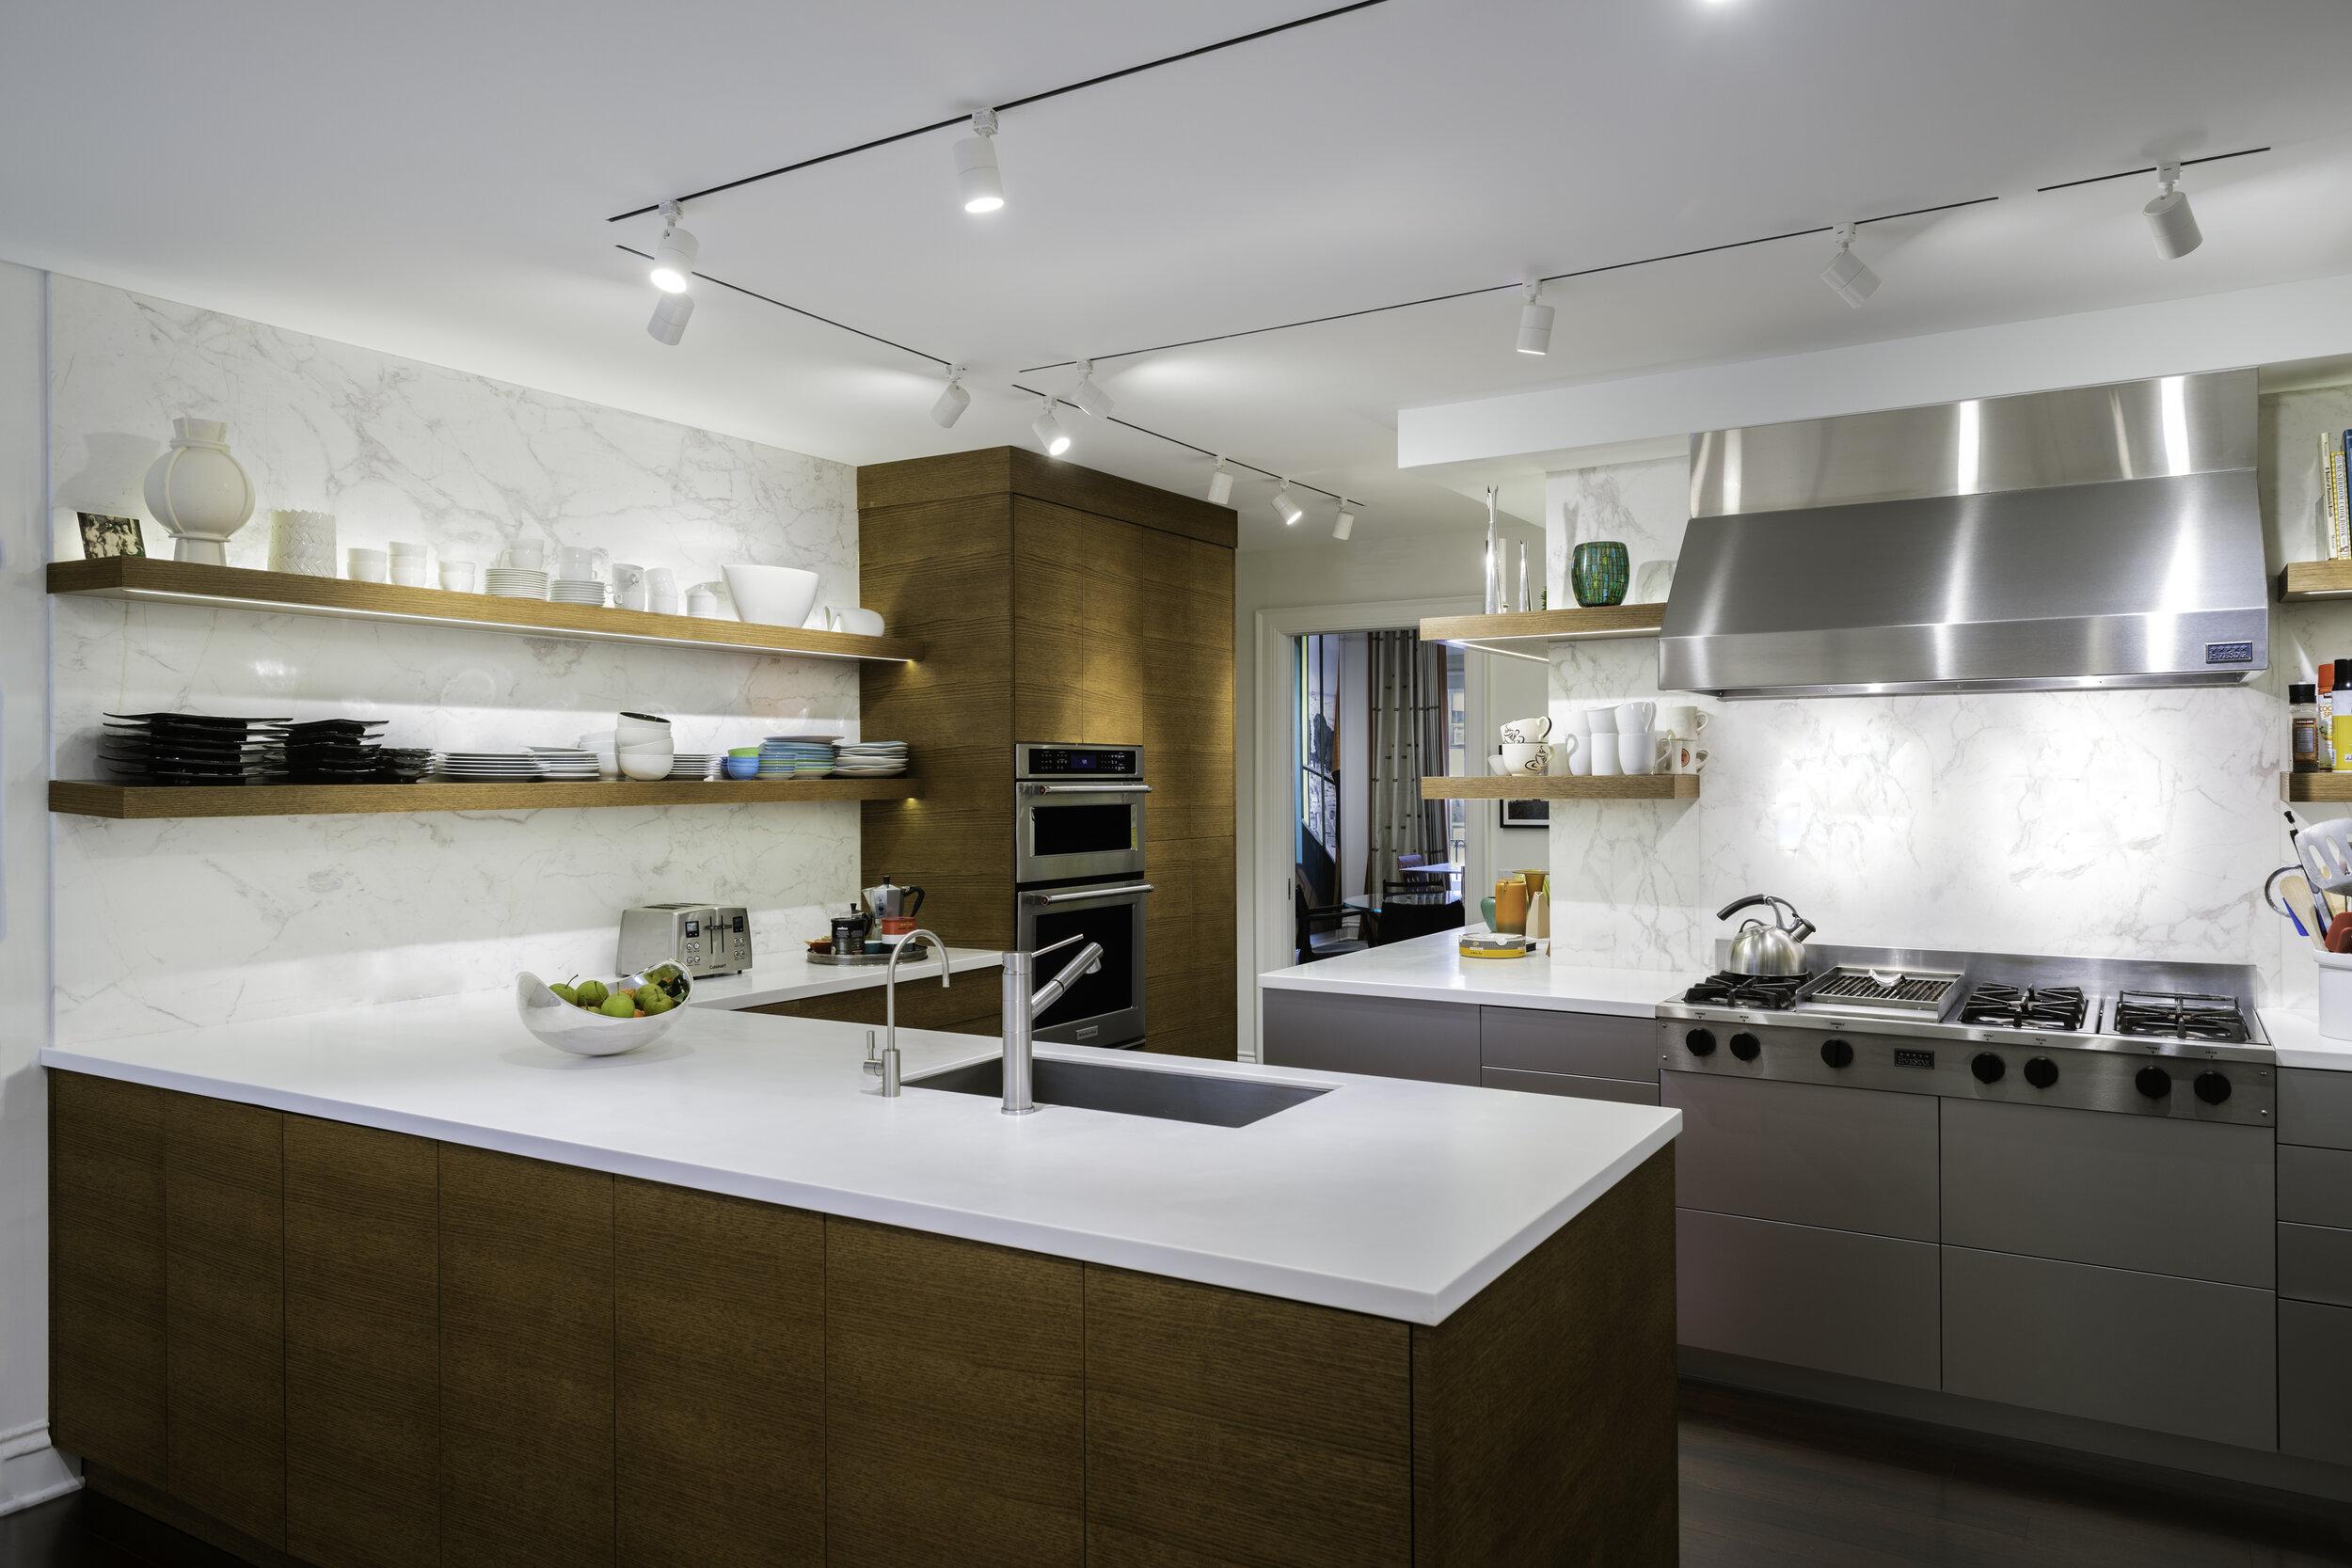 Koppel Kitchen